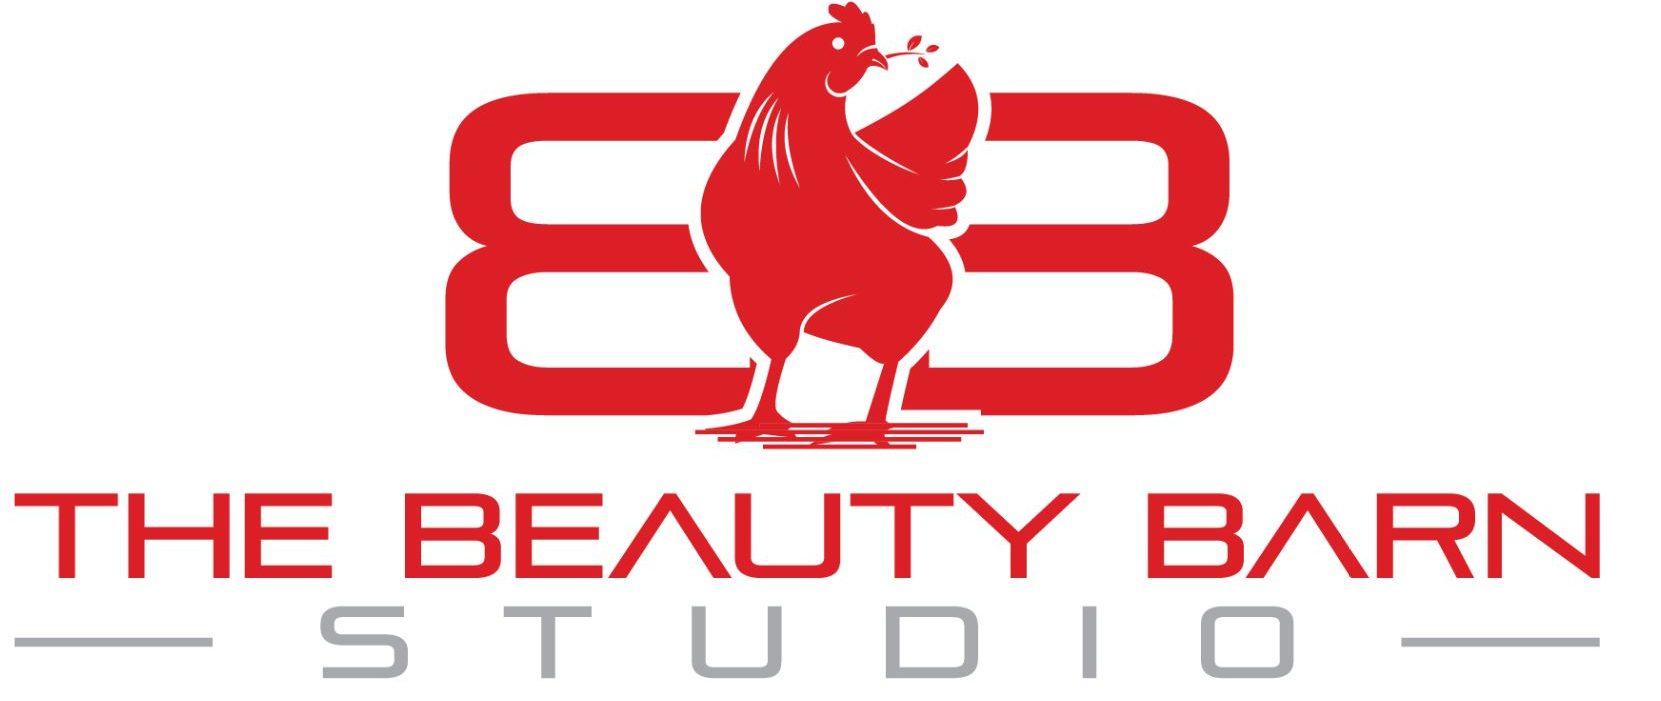 The Beauty Barn Studio